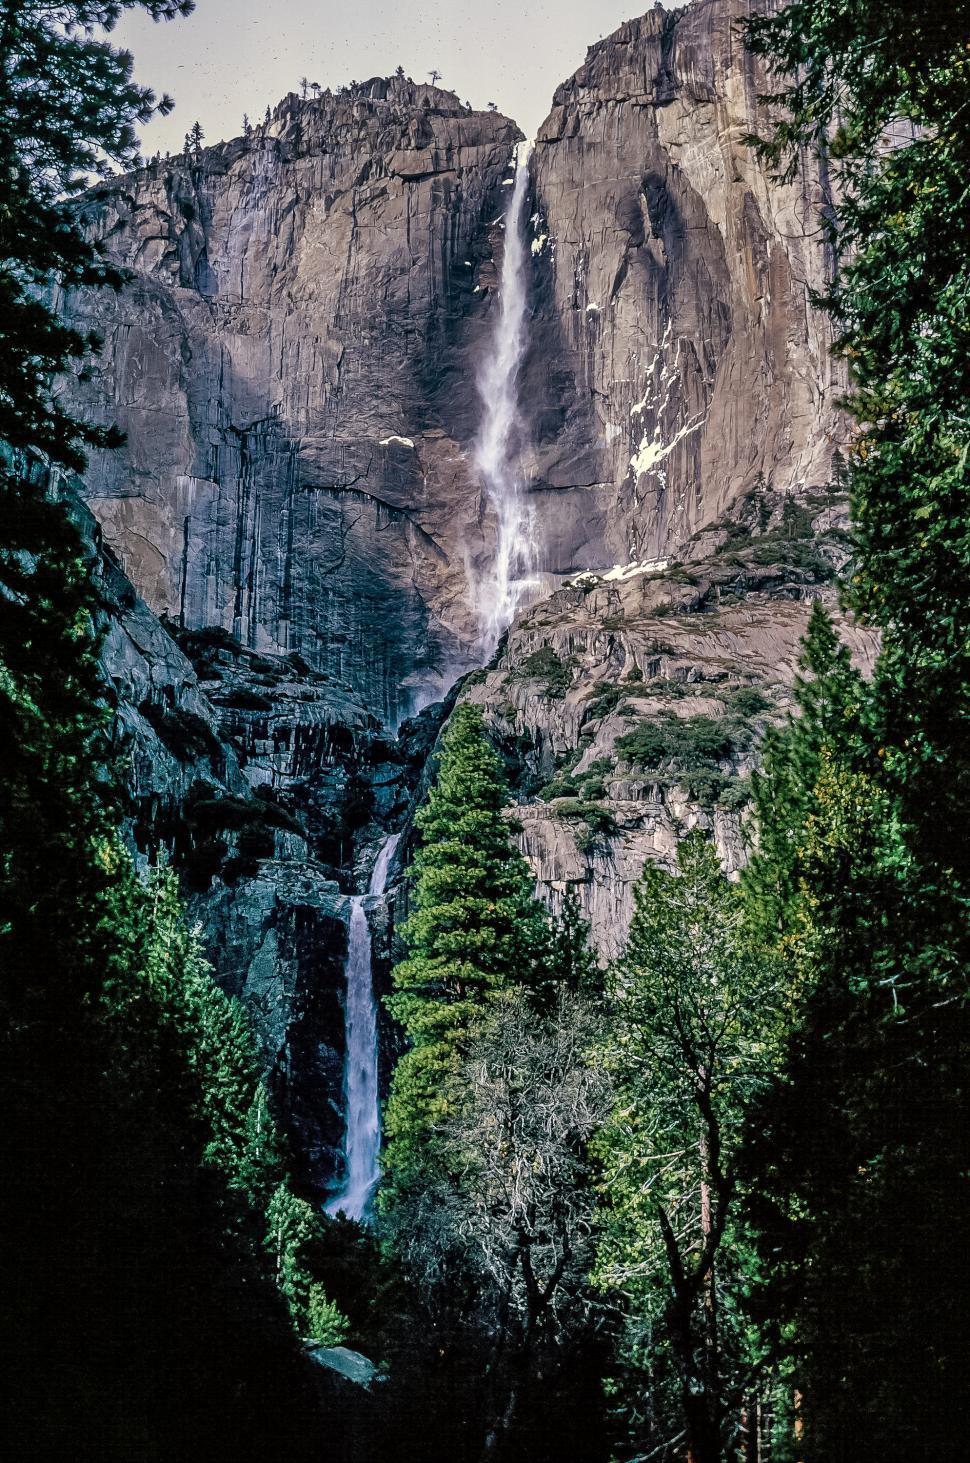 Download Free Stock Photo of Yosemite Falls